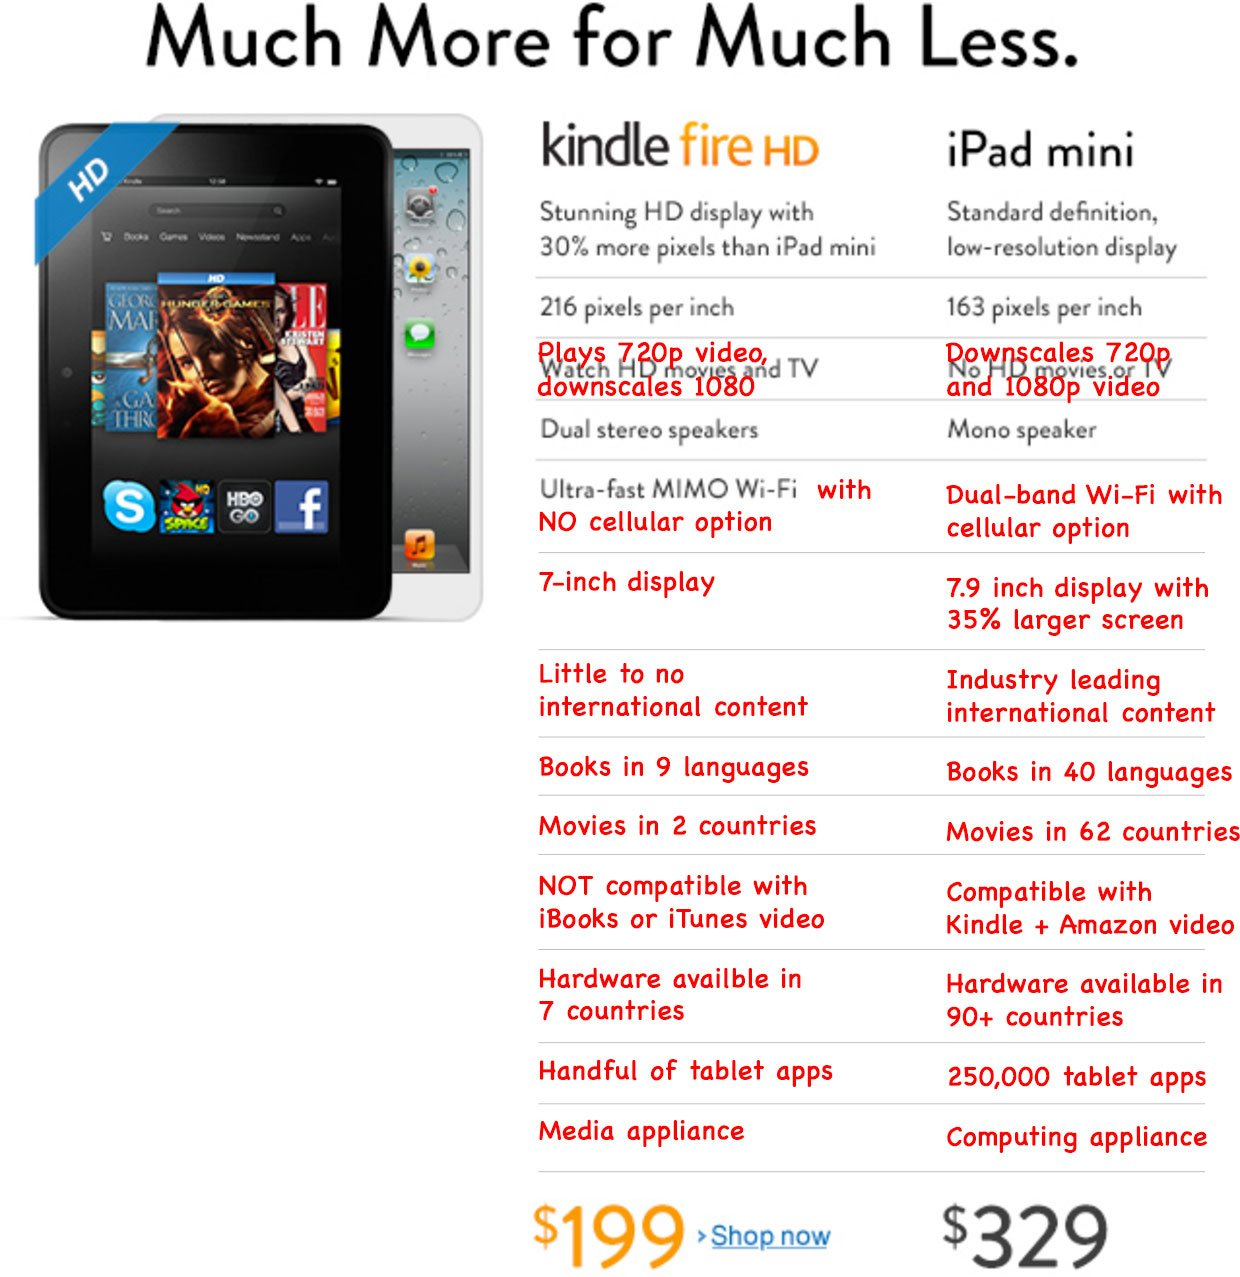 "Amazon Kindle Fire HD vs. Apple iPad mini: Amazon Werbung ""Much More for Much Less"" richtiggestellt... 1"